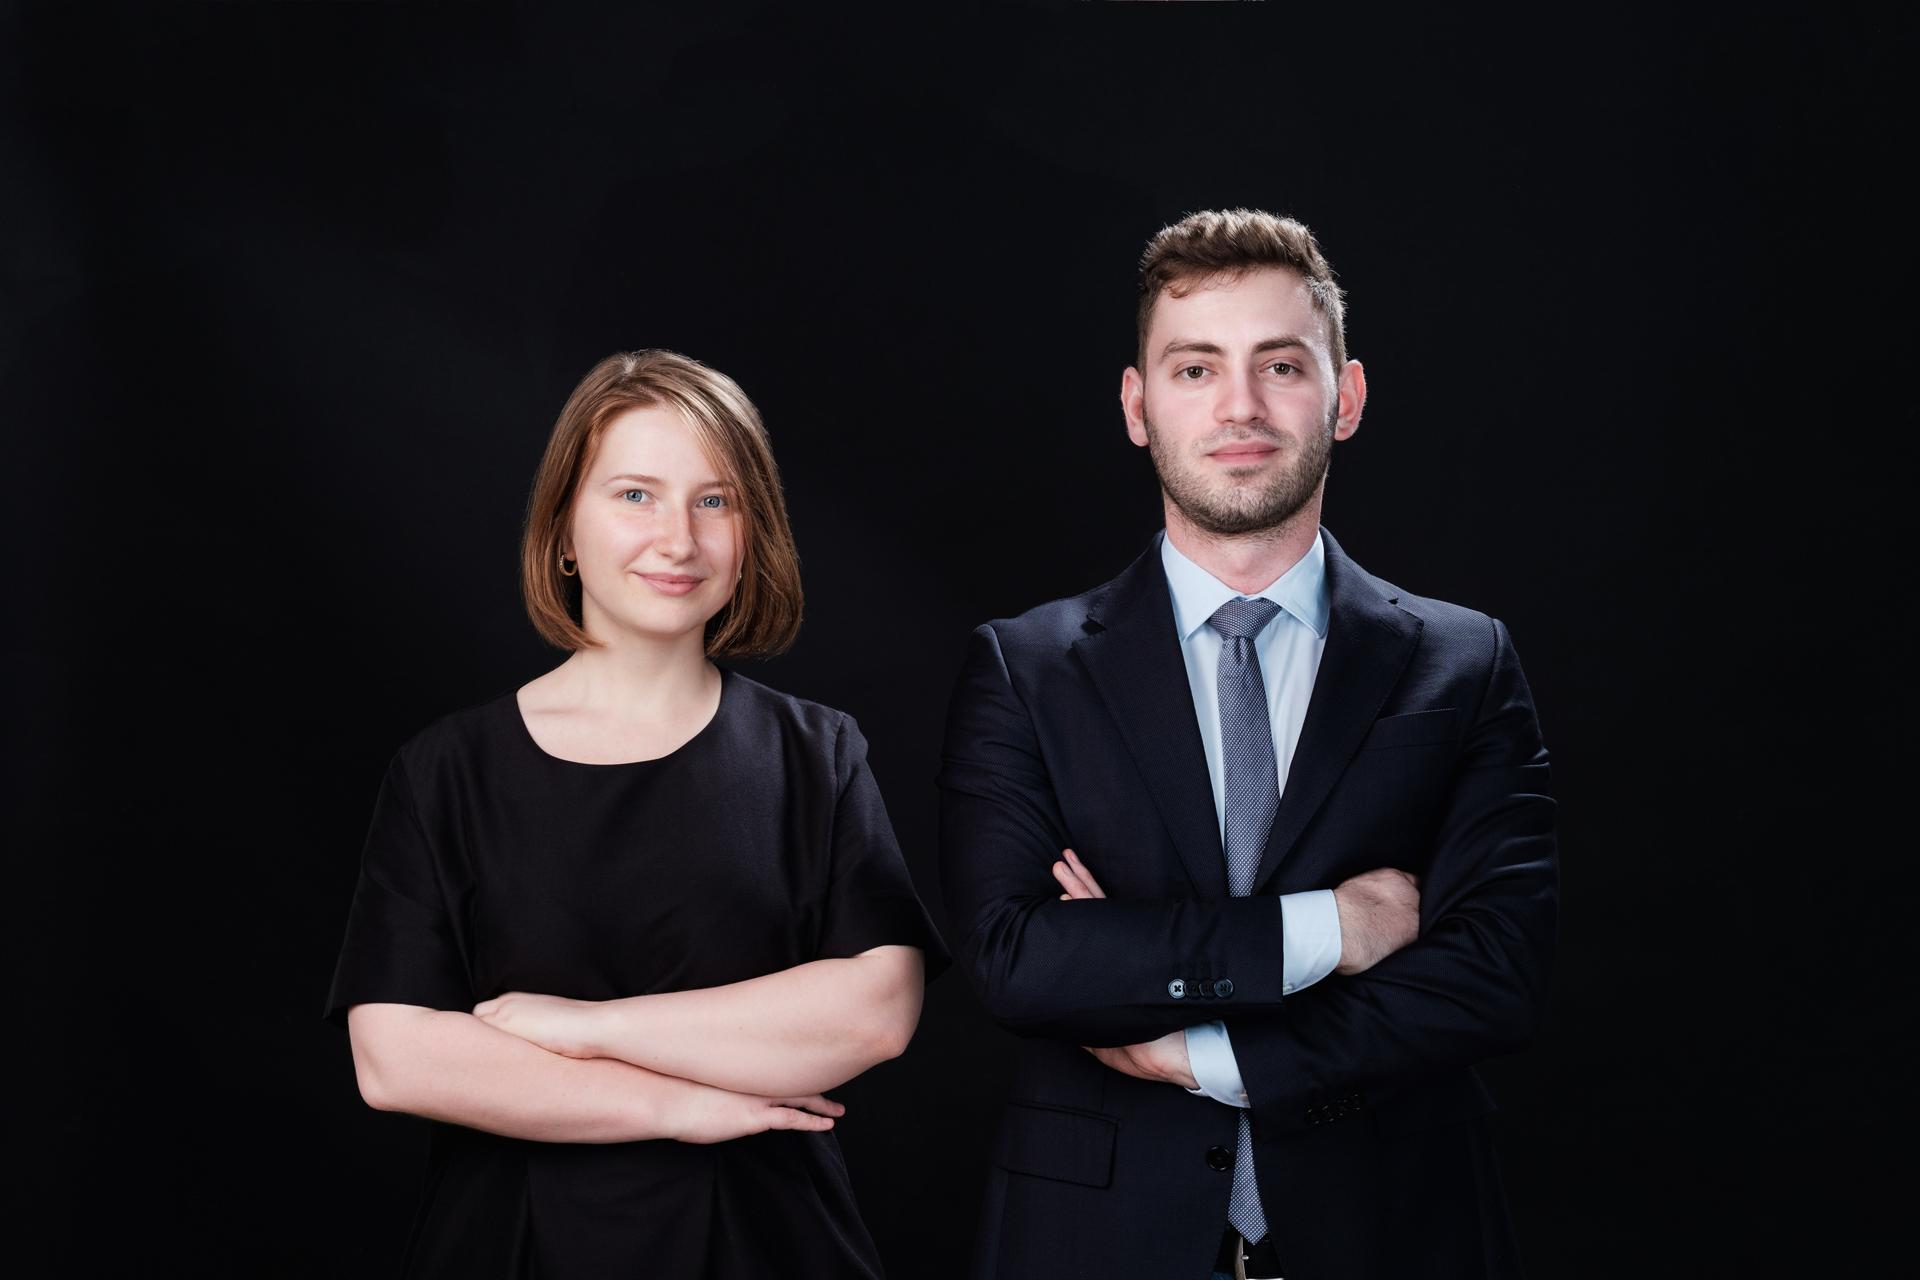 Raluca_HRITCU_si_Stefan_MORTICI__Country_Managers__Gault_Millau_Romania.jpg